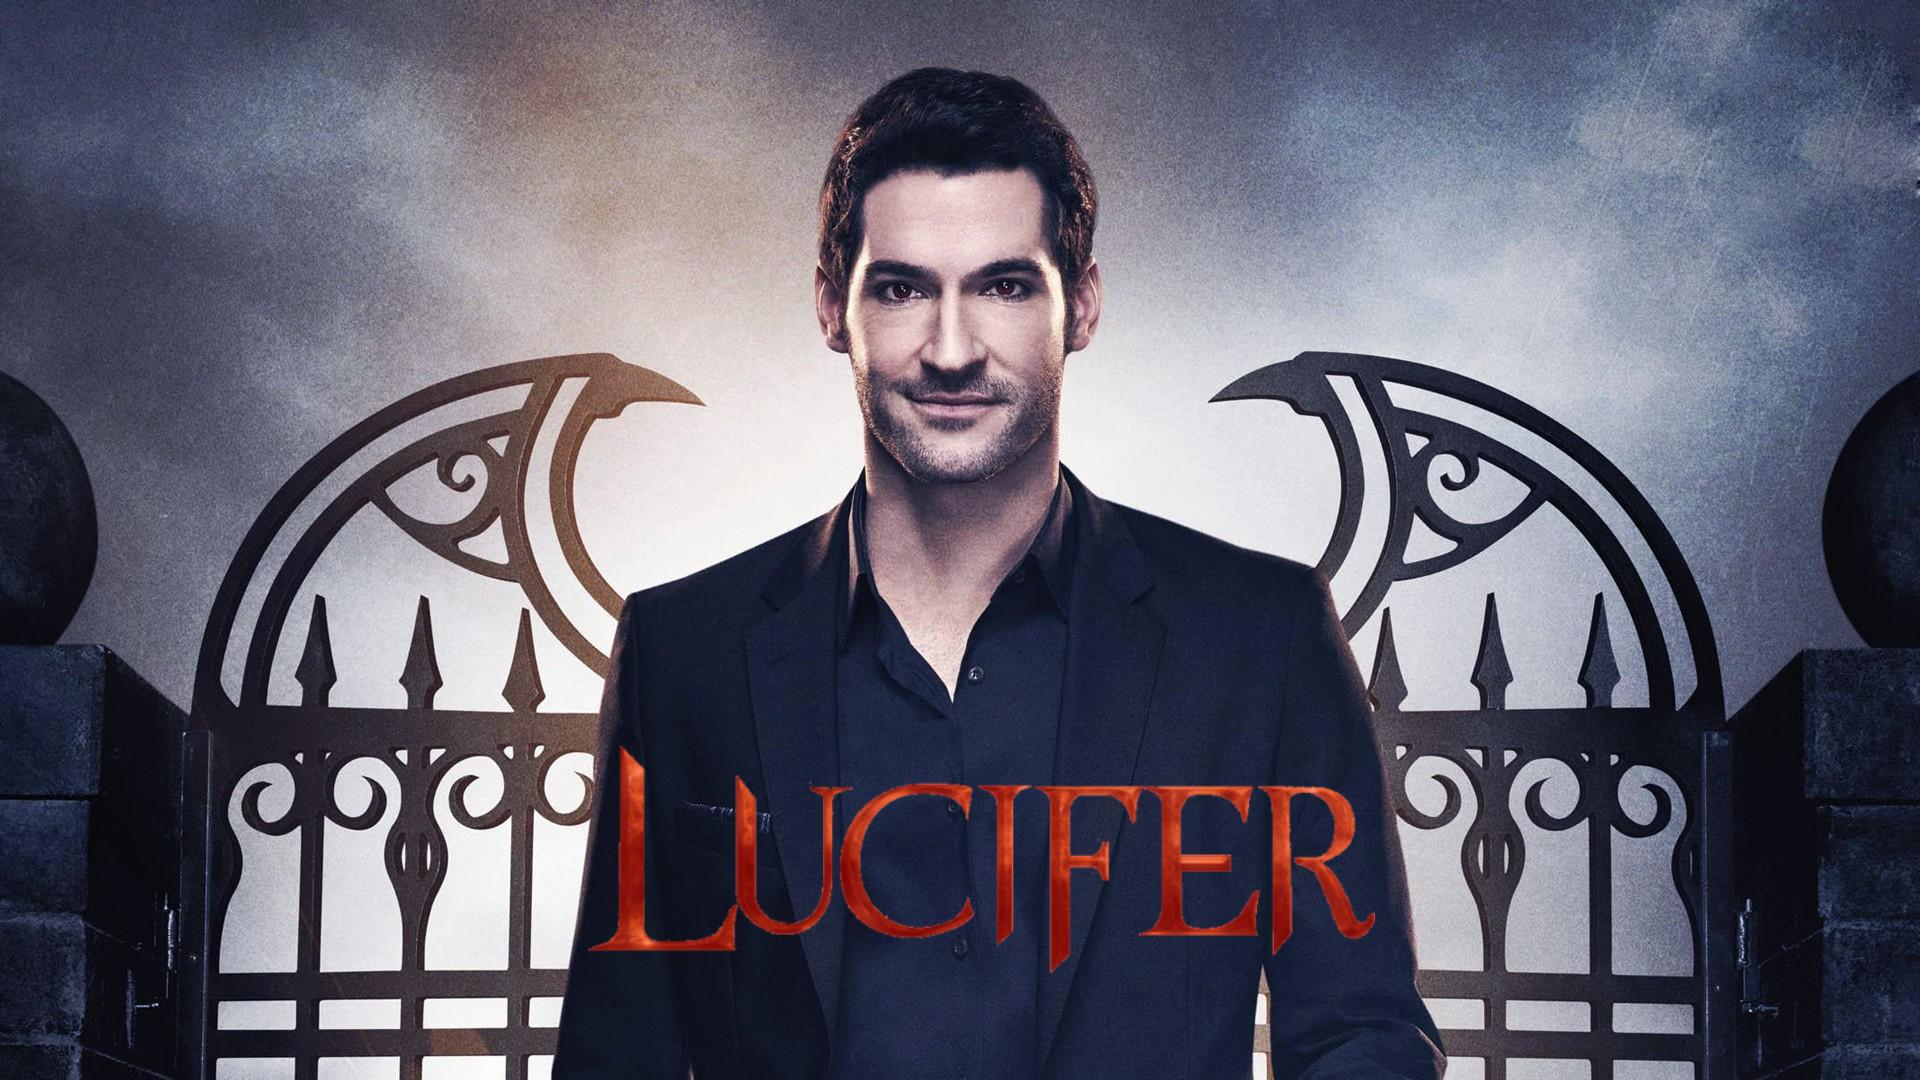 Lucifer Season 5 Episode 1 update